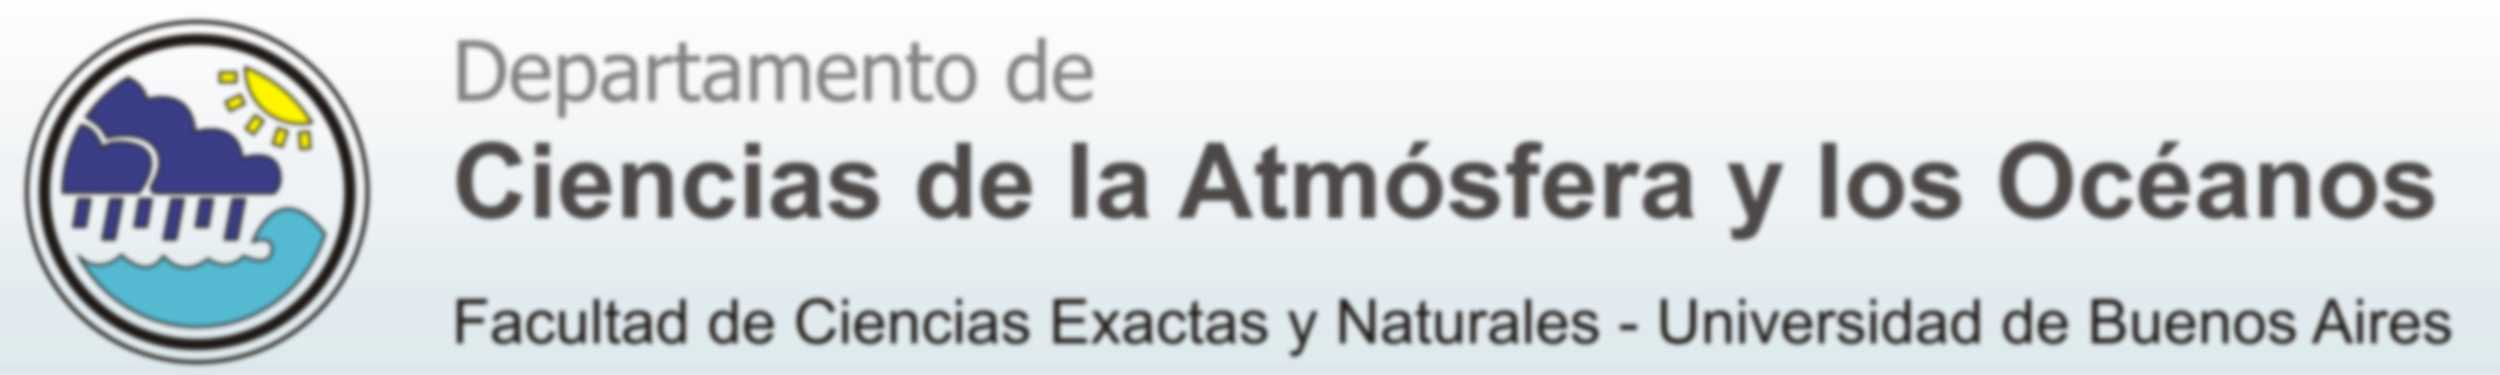 logo DCAO